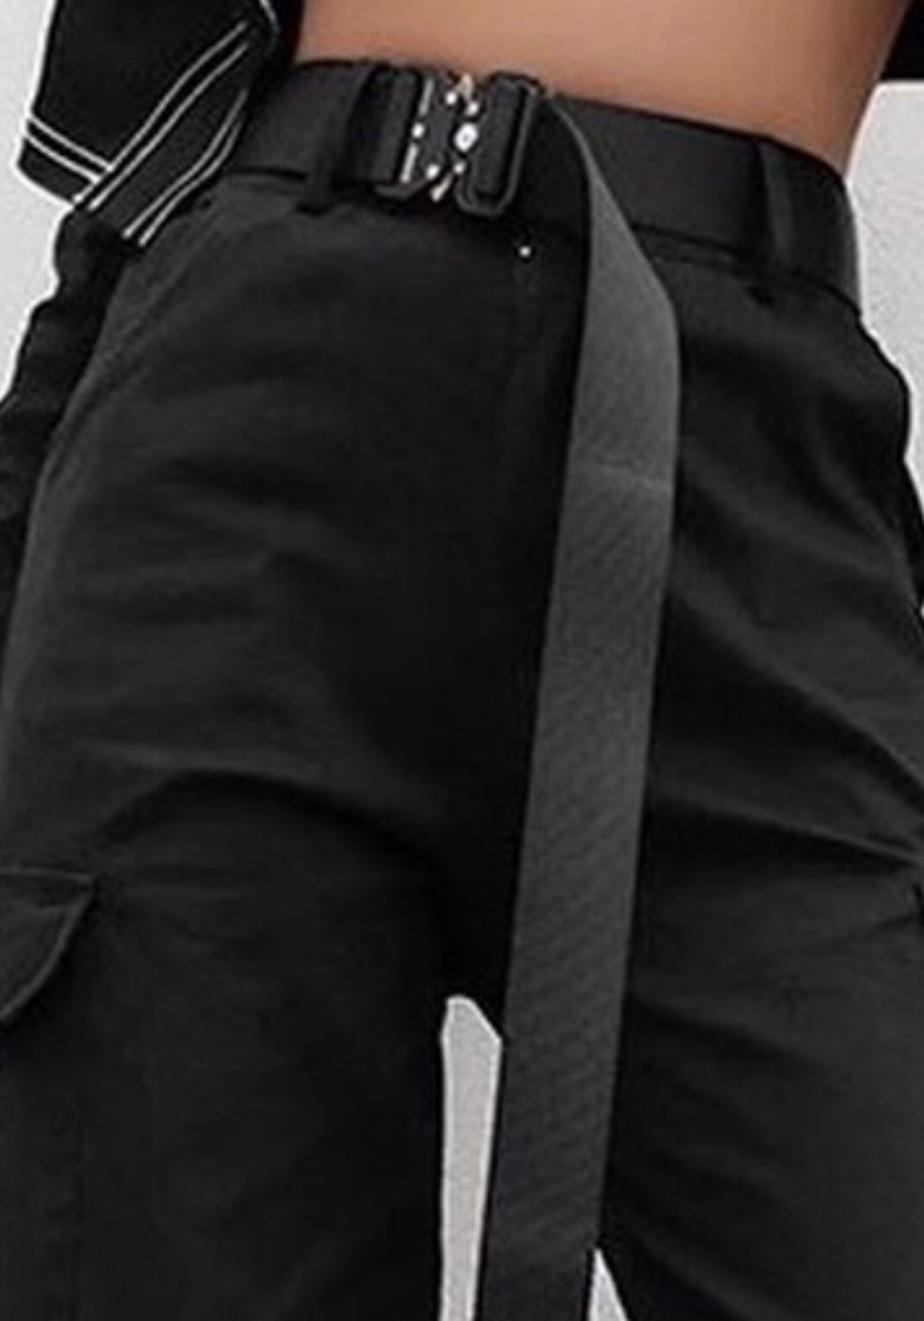 belt black metal belt